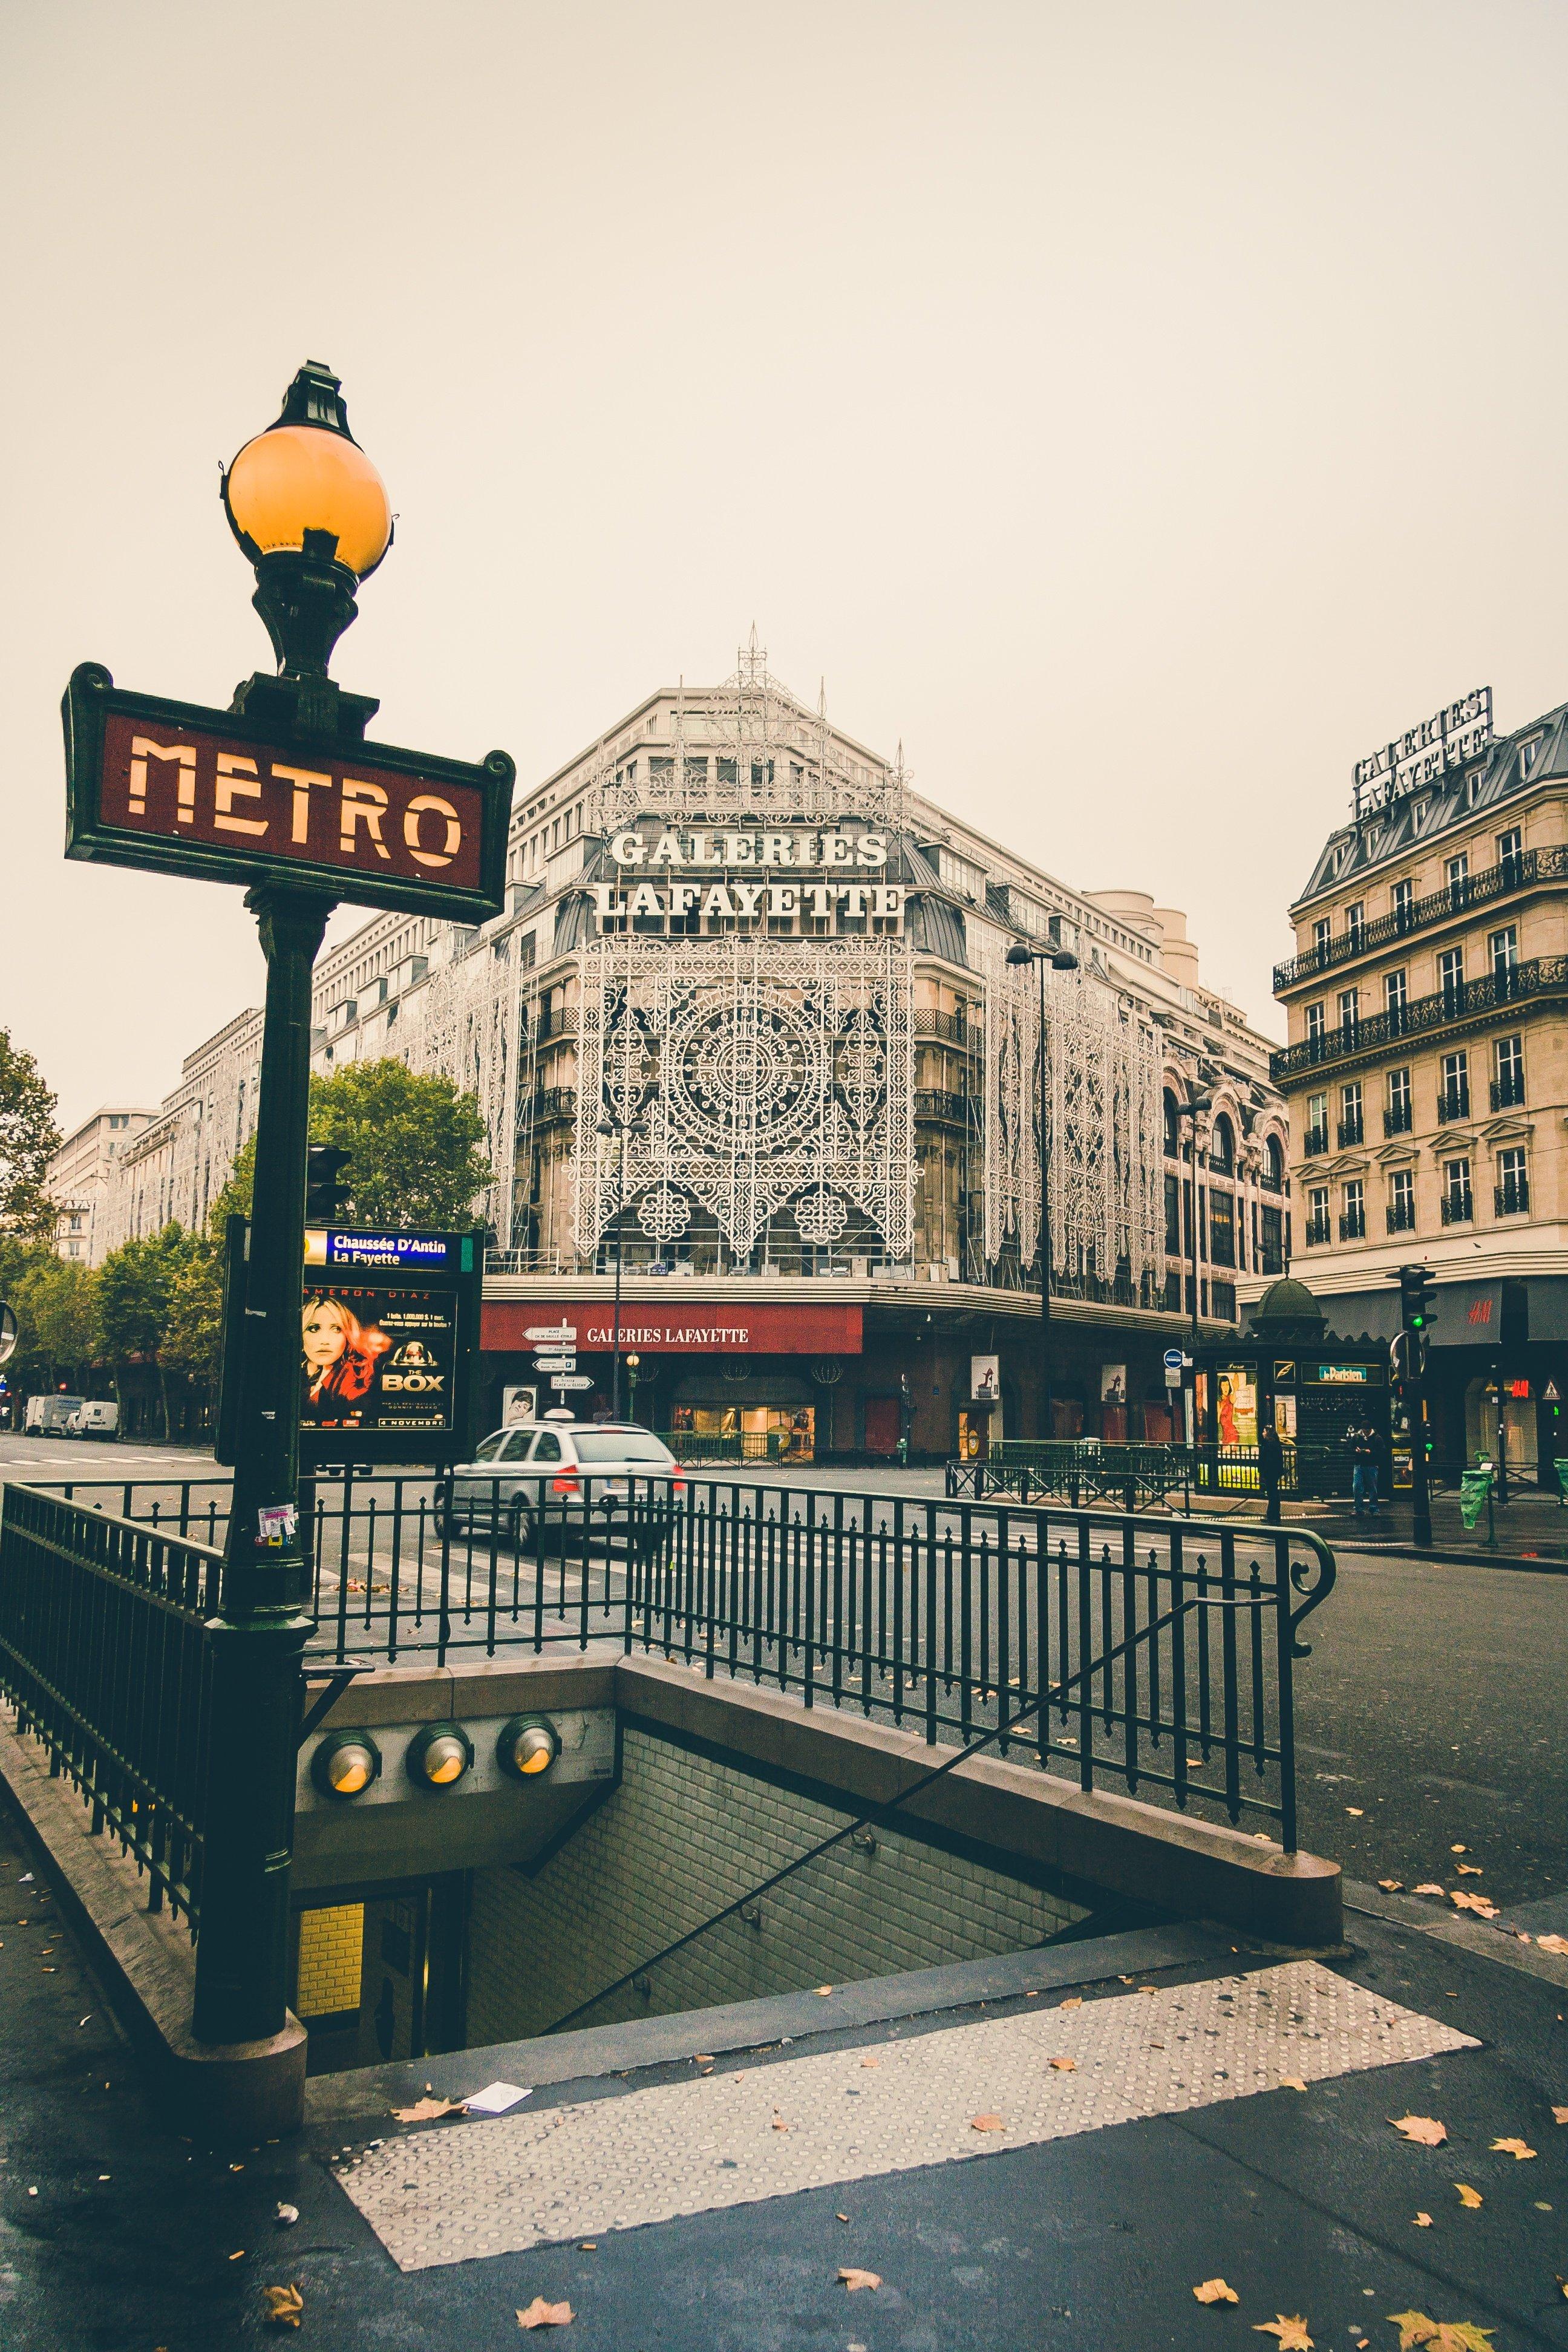 Image of a metro entrance in Paris